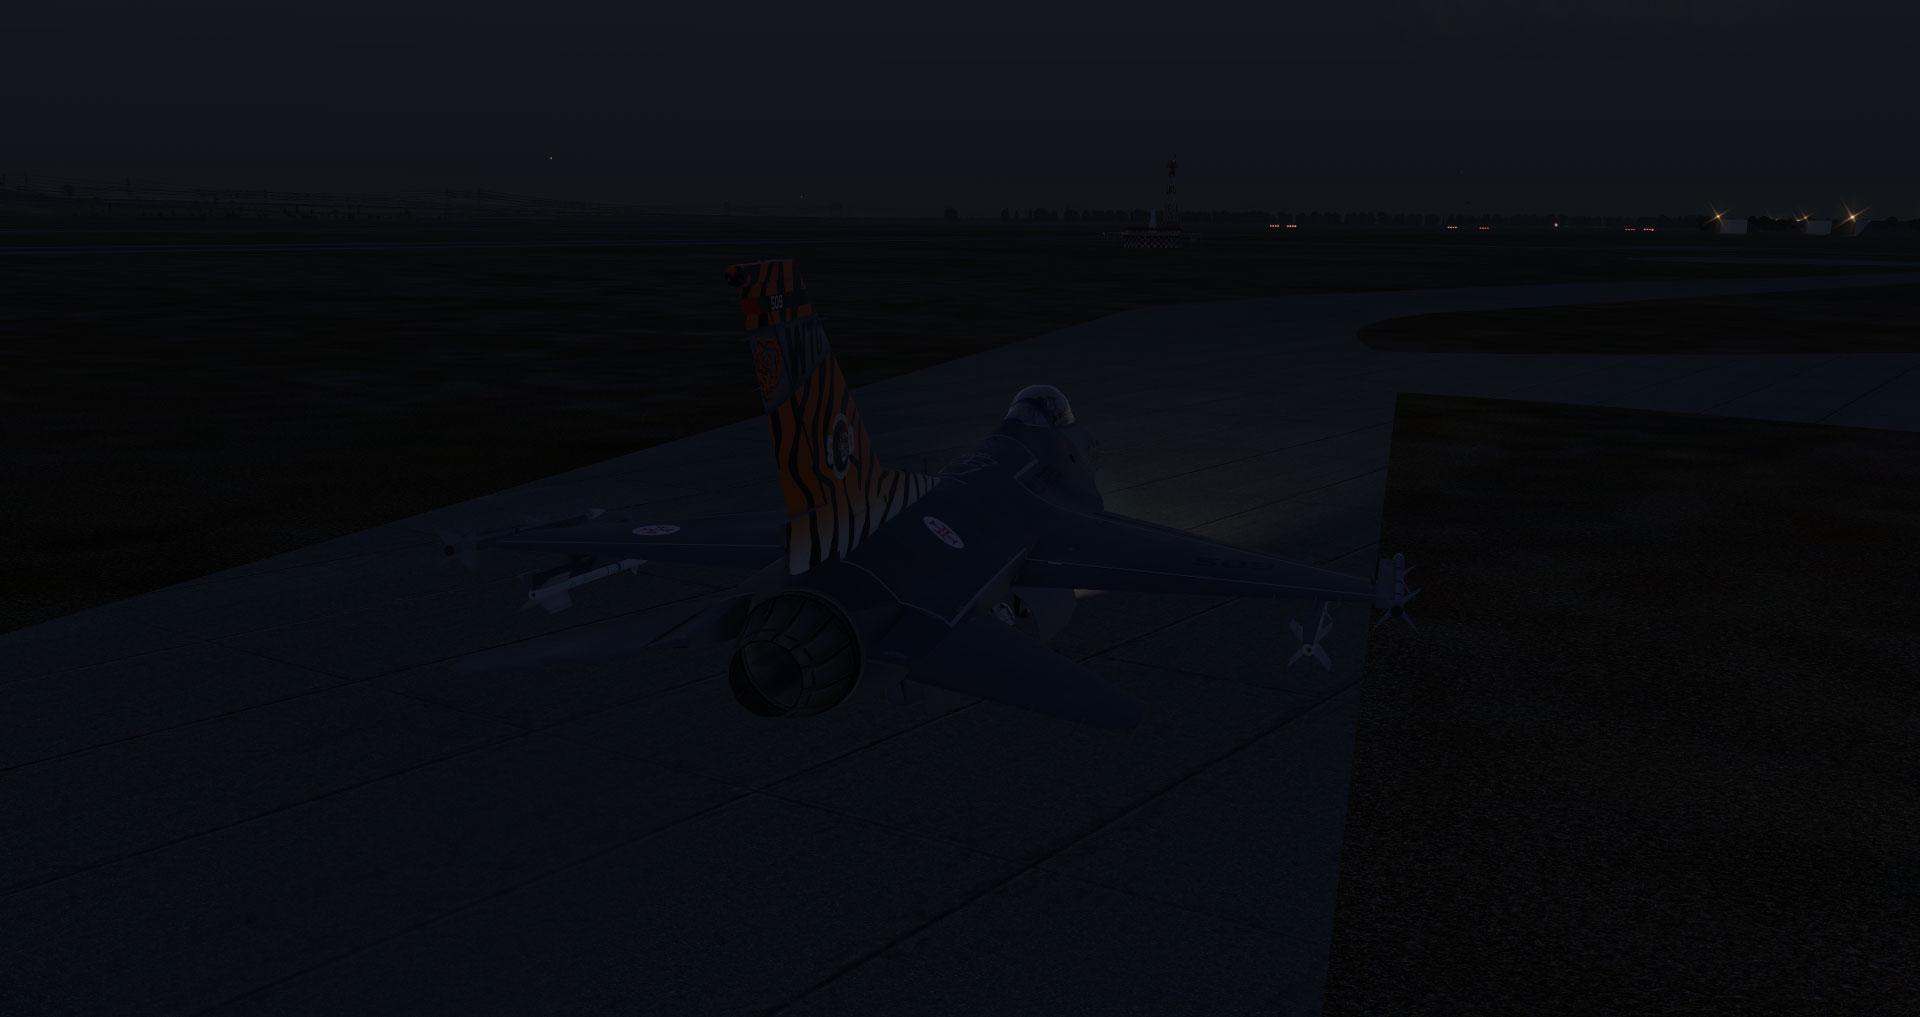 F_16---2021-03-21-17.10